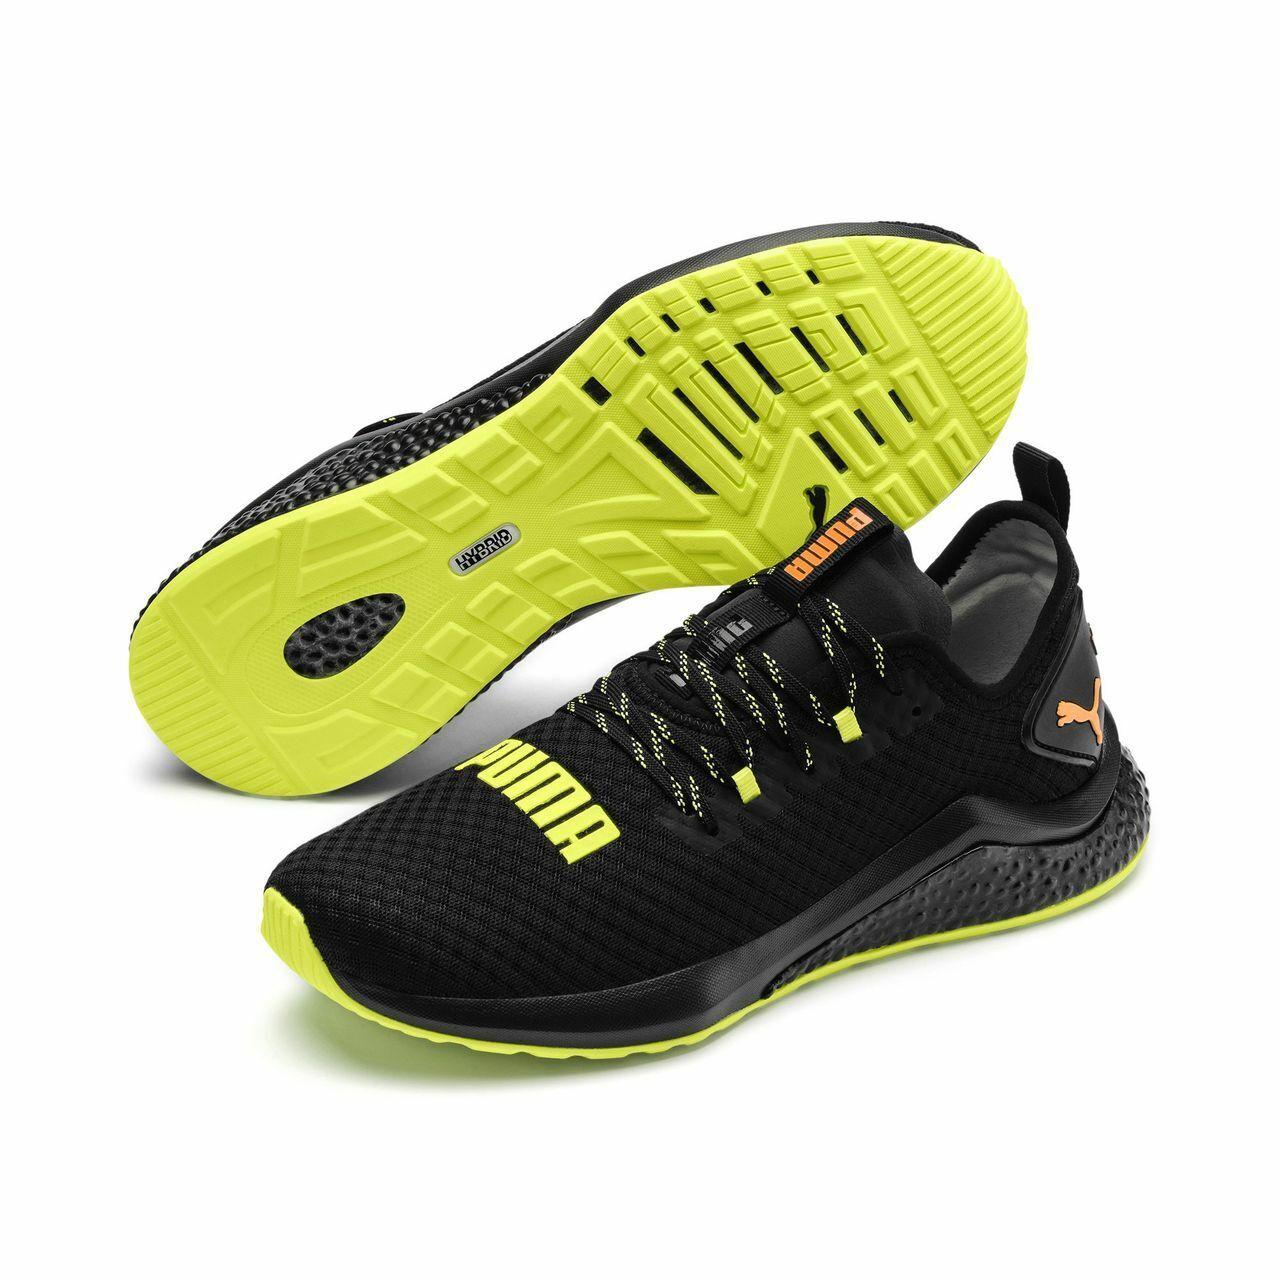 Puma Hybrid NX Daylight señores outdoor zapatillas para correr fitness zapatos 192365 02